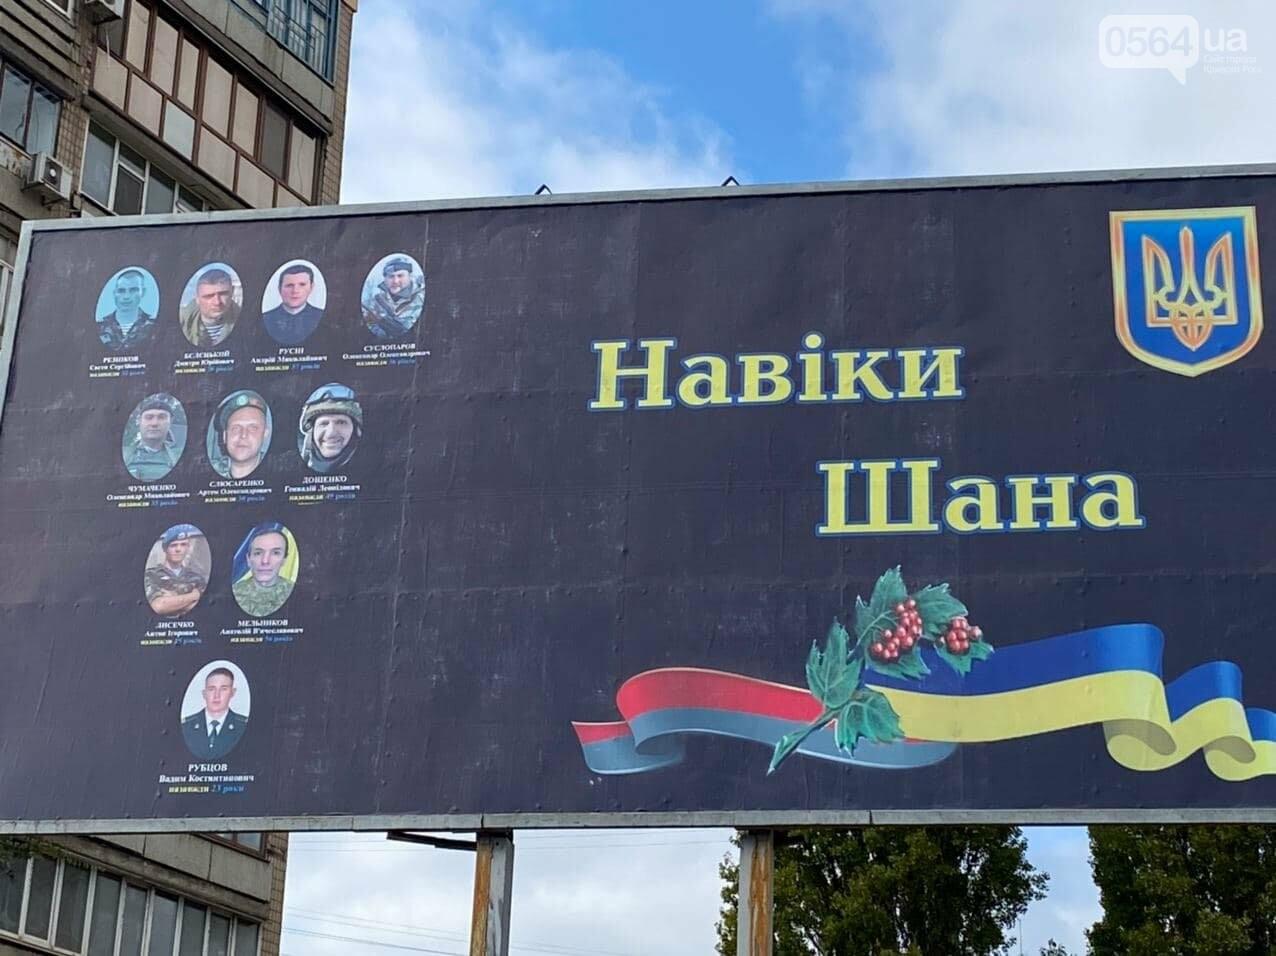 """Навіки шана"": В центре Кривого Рога разместили борд с фотографиями 10 погибших Героев, - ФОТО , фото-2"